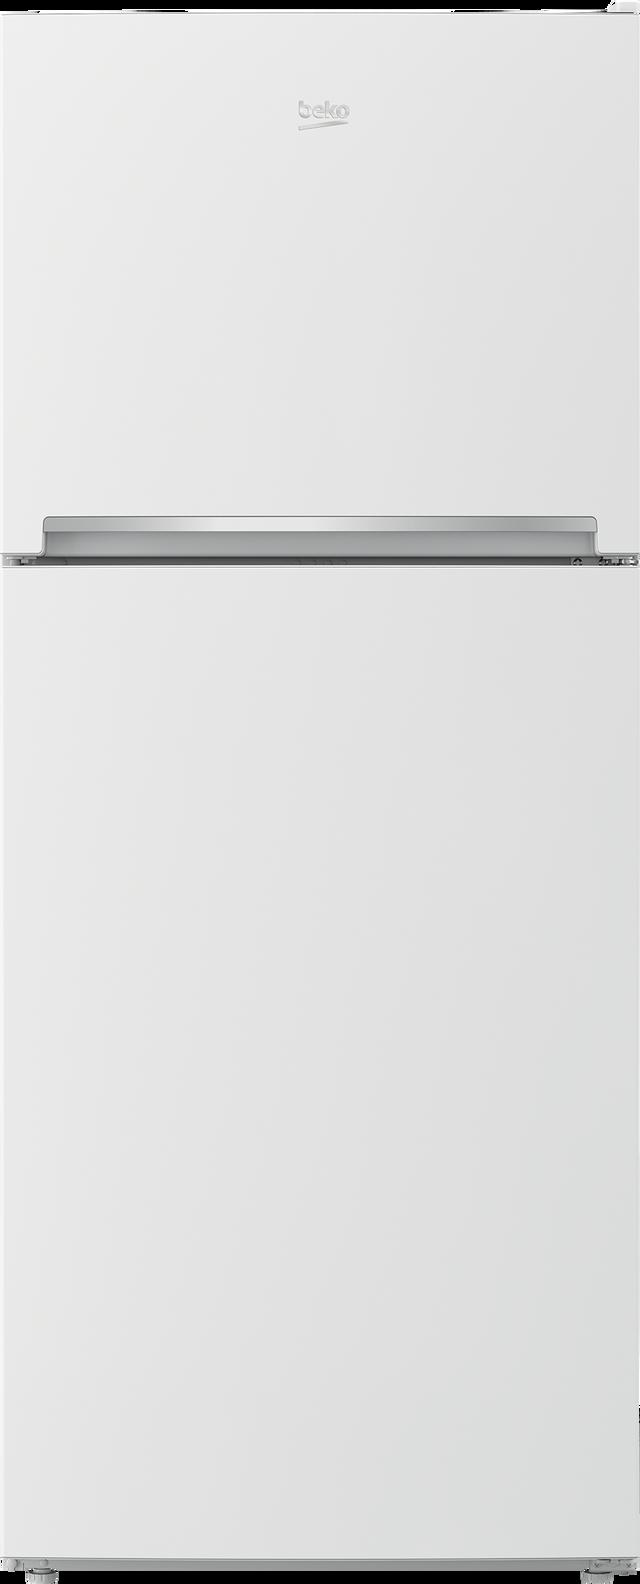 Beko 13.5 Cu. Ft. White Counter Depth Top Mount Refrigerator-BFTF2716WH